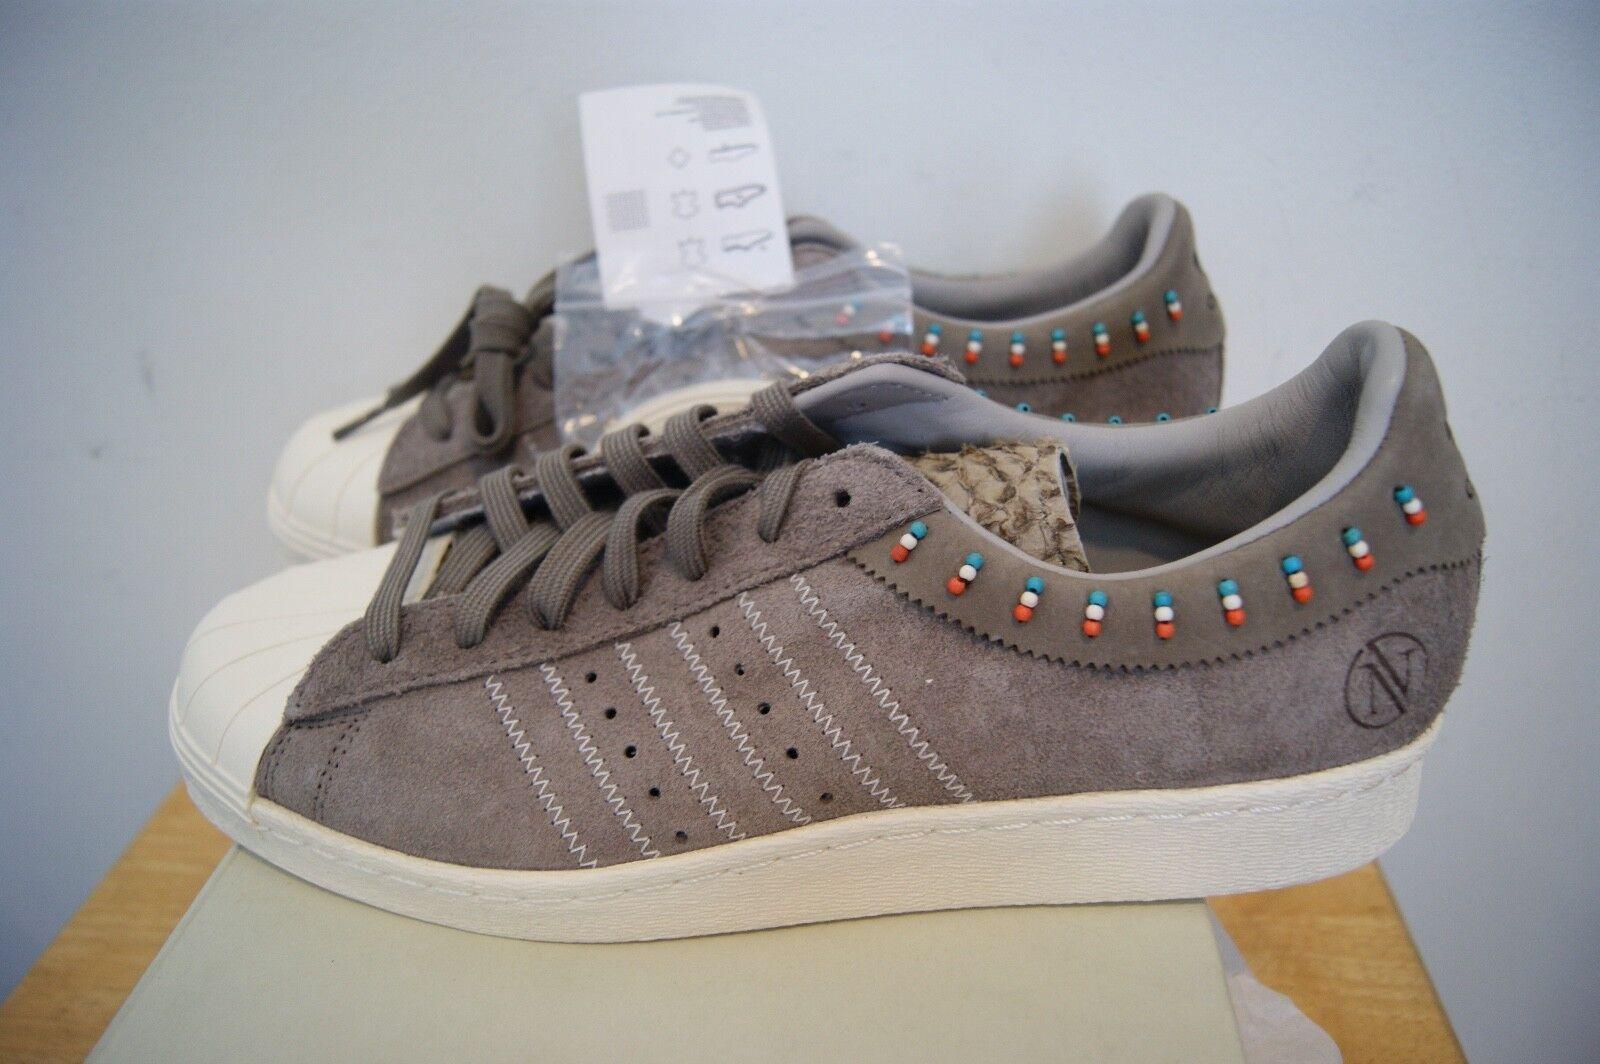 Adidas Superstar 80v x Invincible B34290 Men size US 10 NEW 100% Authentic